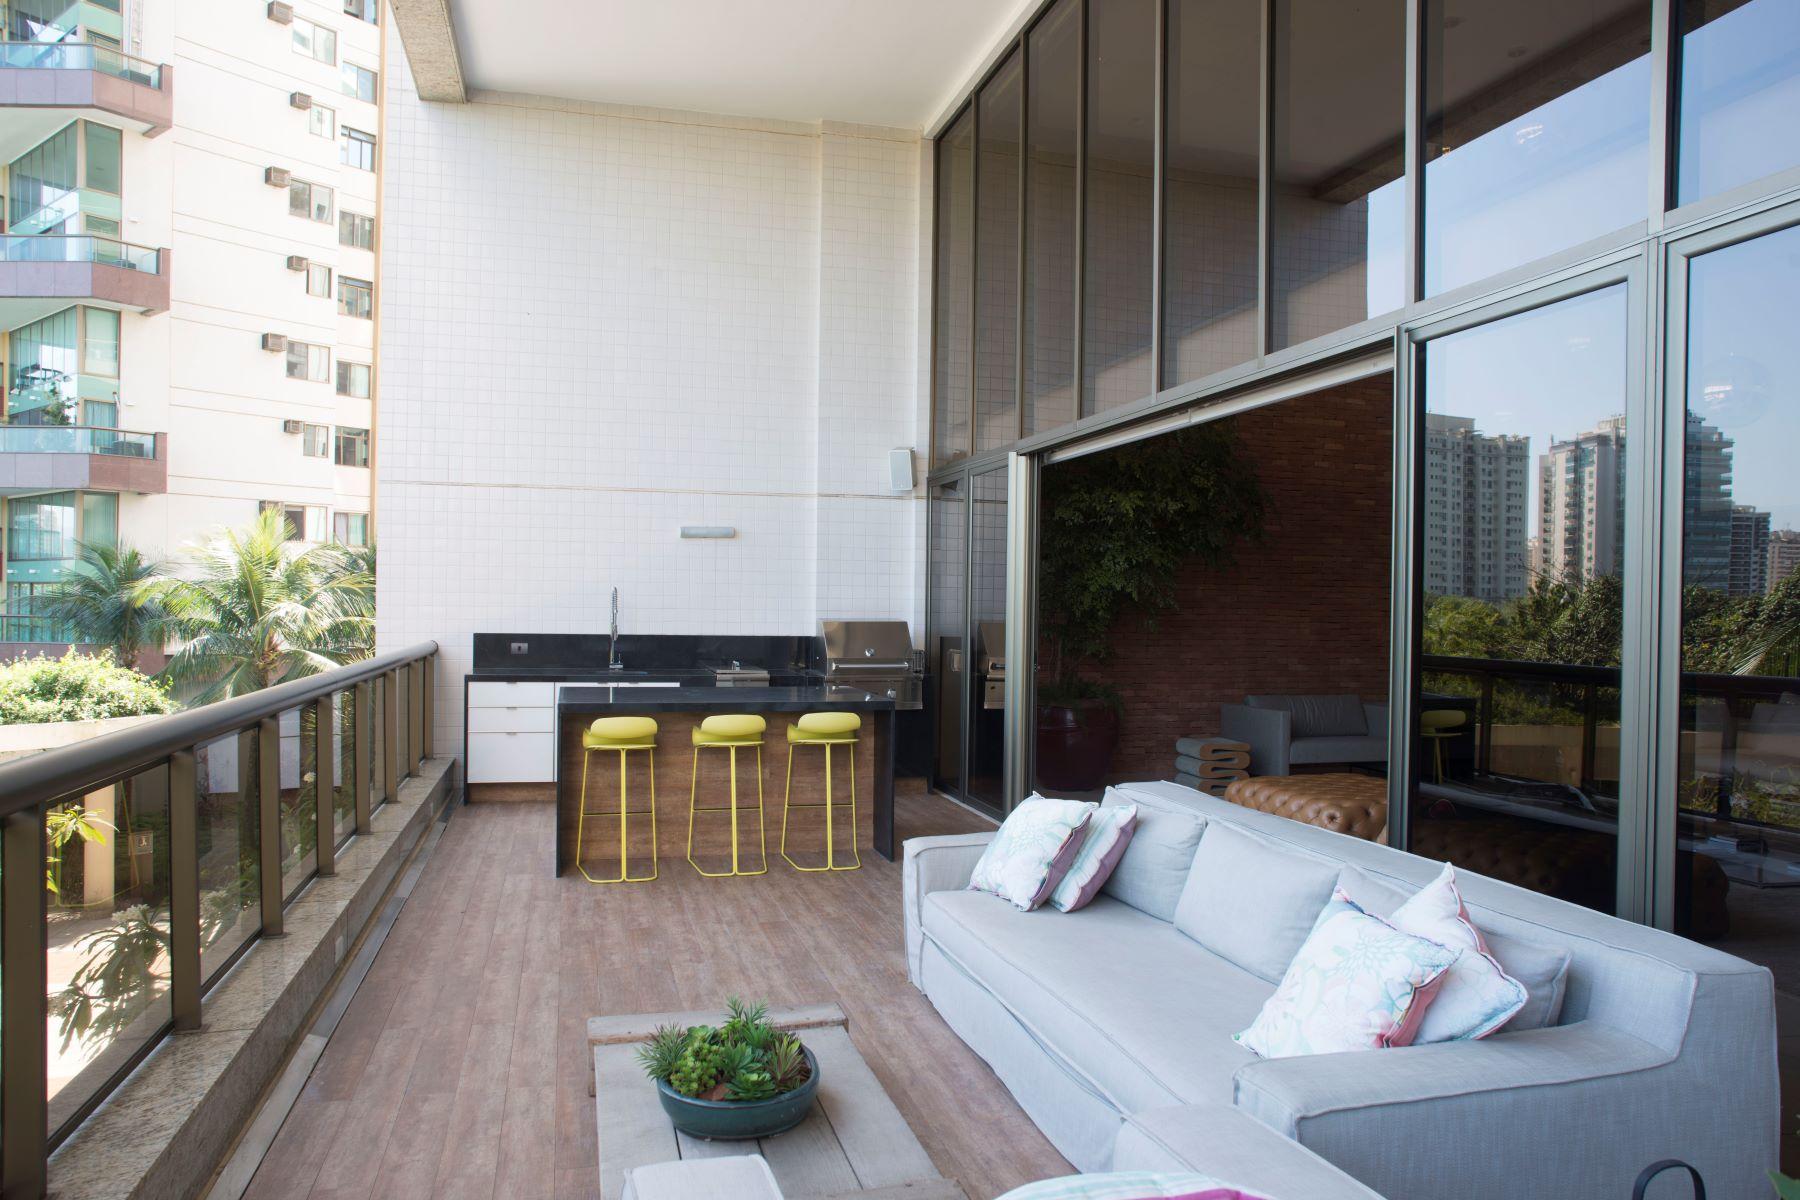 Maison unifamiliale pour l Vente à Duplex Apartment Avenida dos Flamboyants da Península Rio De Janeiro, Rio De Janeiro, 22776070 Brésil